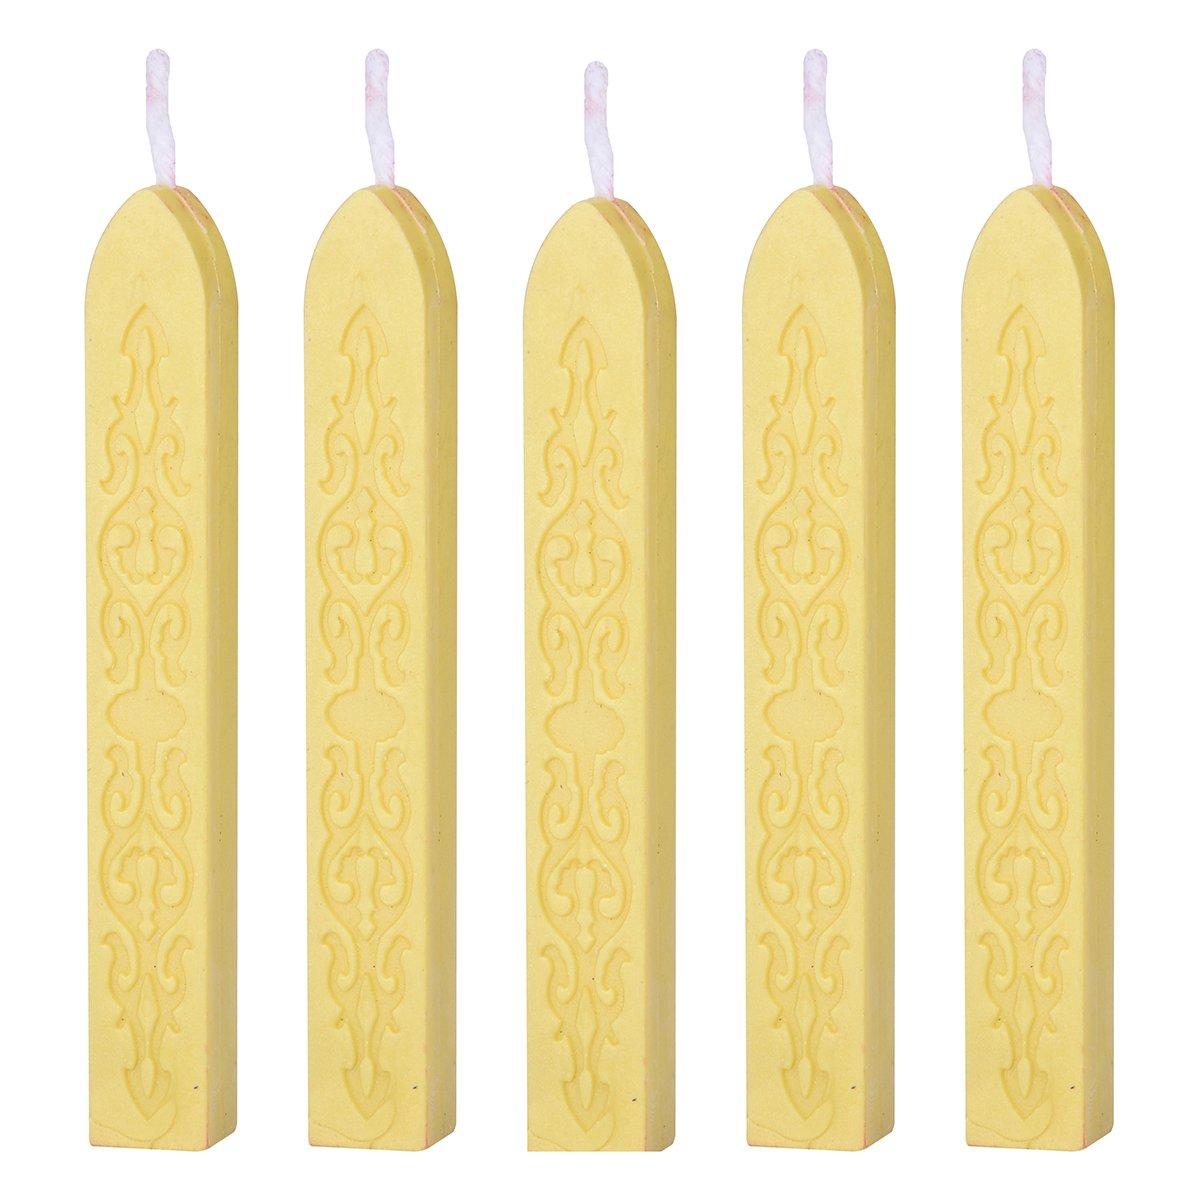 Retro Sealing Wax Sticks with Wicks for Postage Letter Wedding Blue 5 Pcs LiangGui LG00AJ00UH